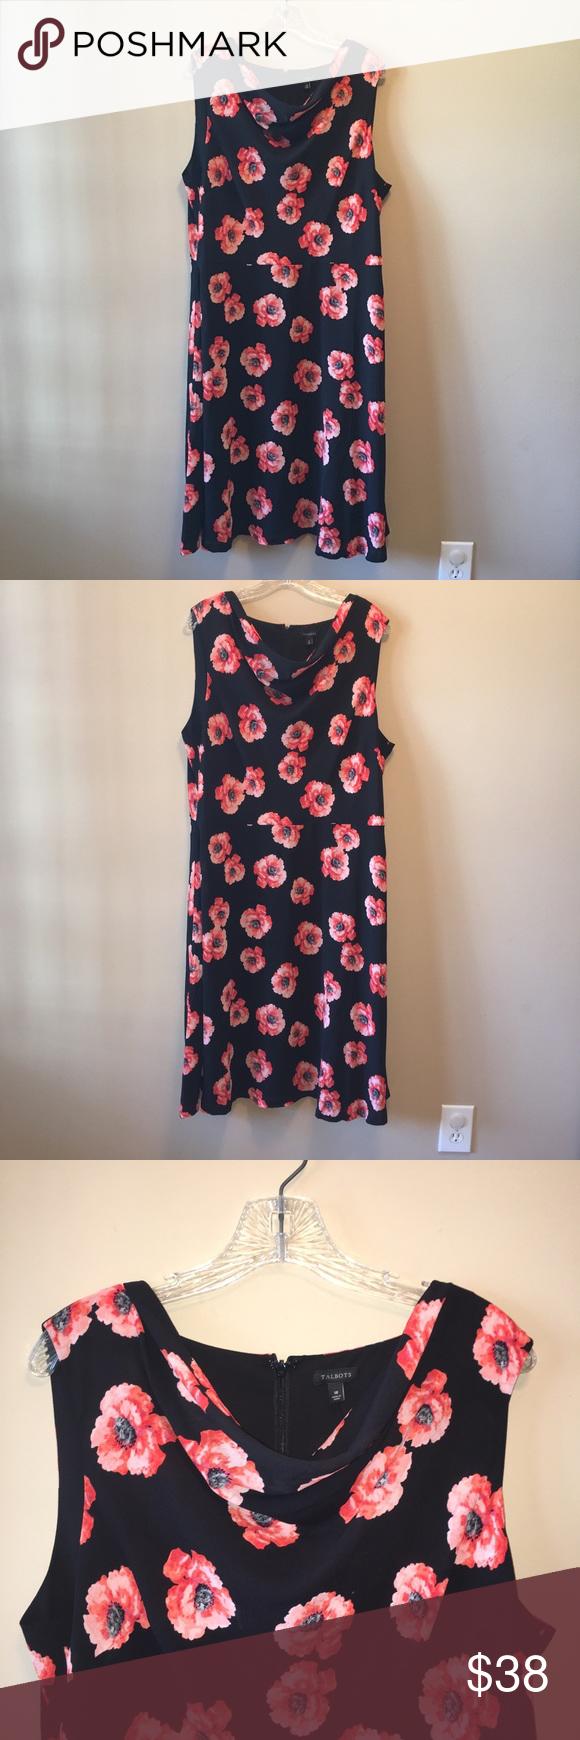 Talbots Summer Dress Nwt Size 18 Talbots Summer Summer Dresses Clothes Design [ 1740 x 580 Pixel ]